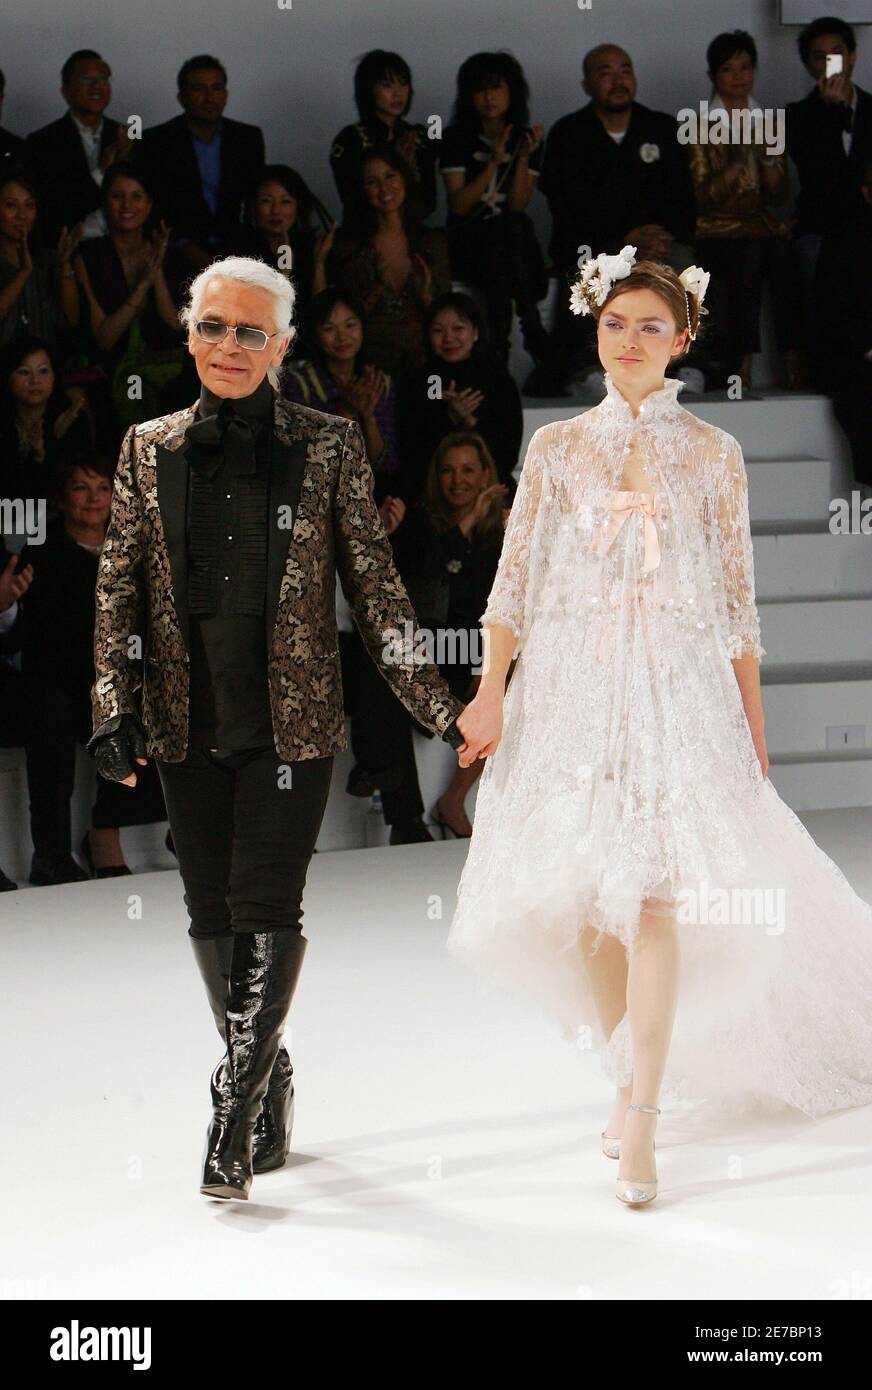 German fashion designer Karl Lagerfeld L escorts a model at the ...